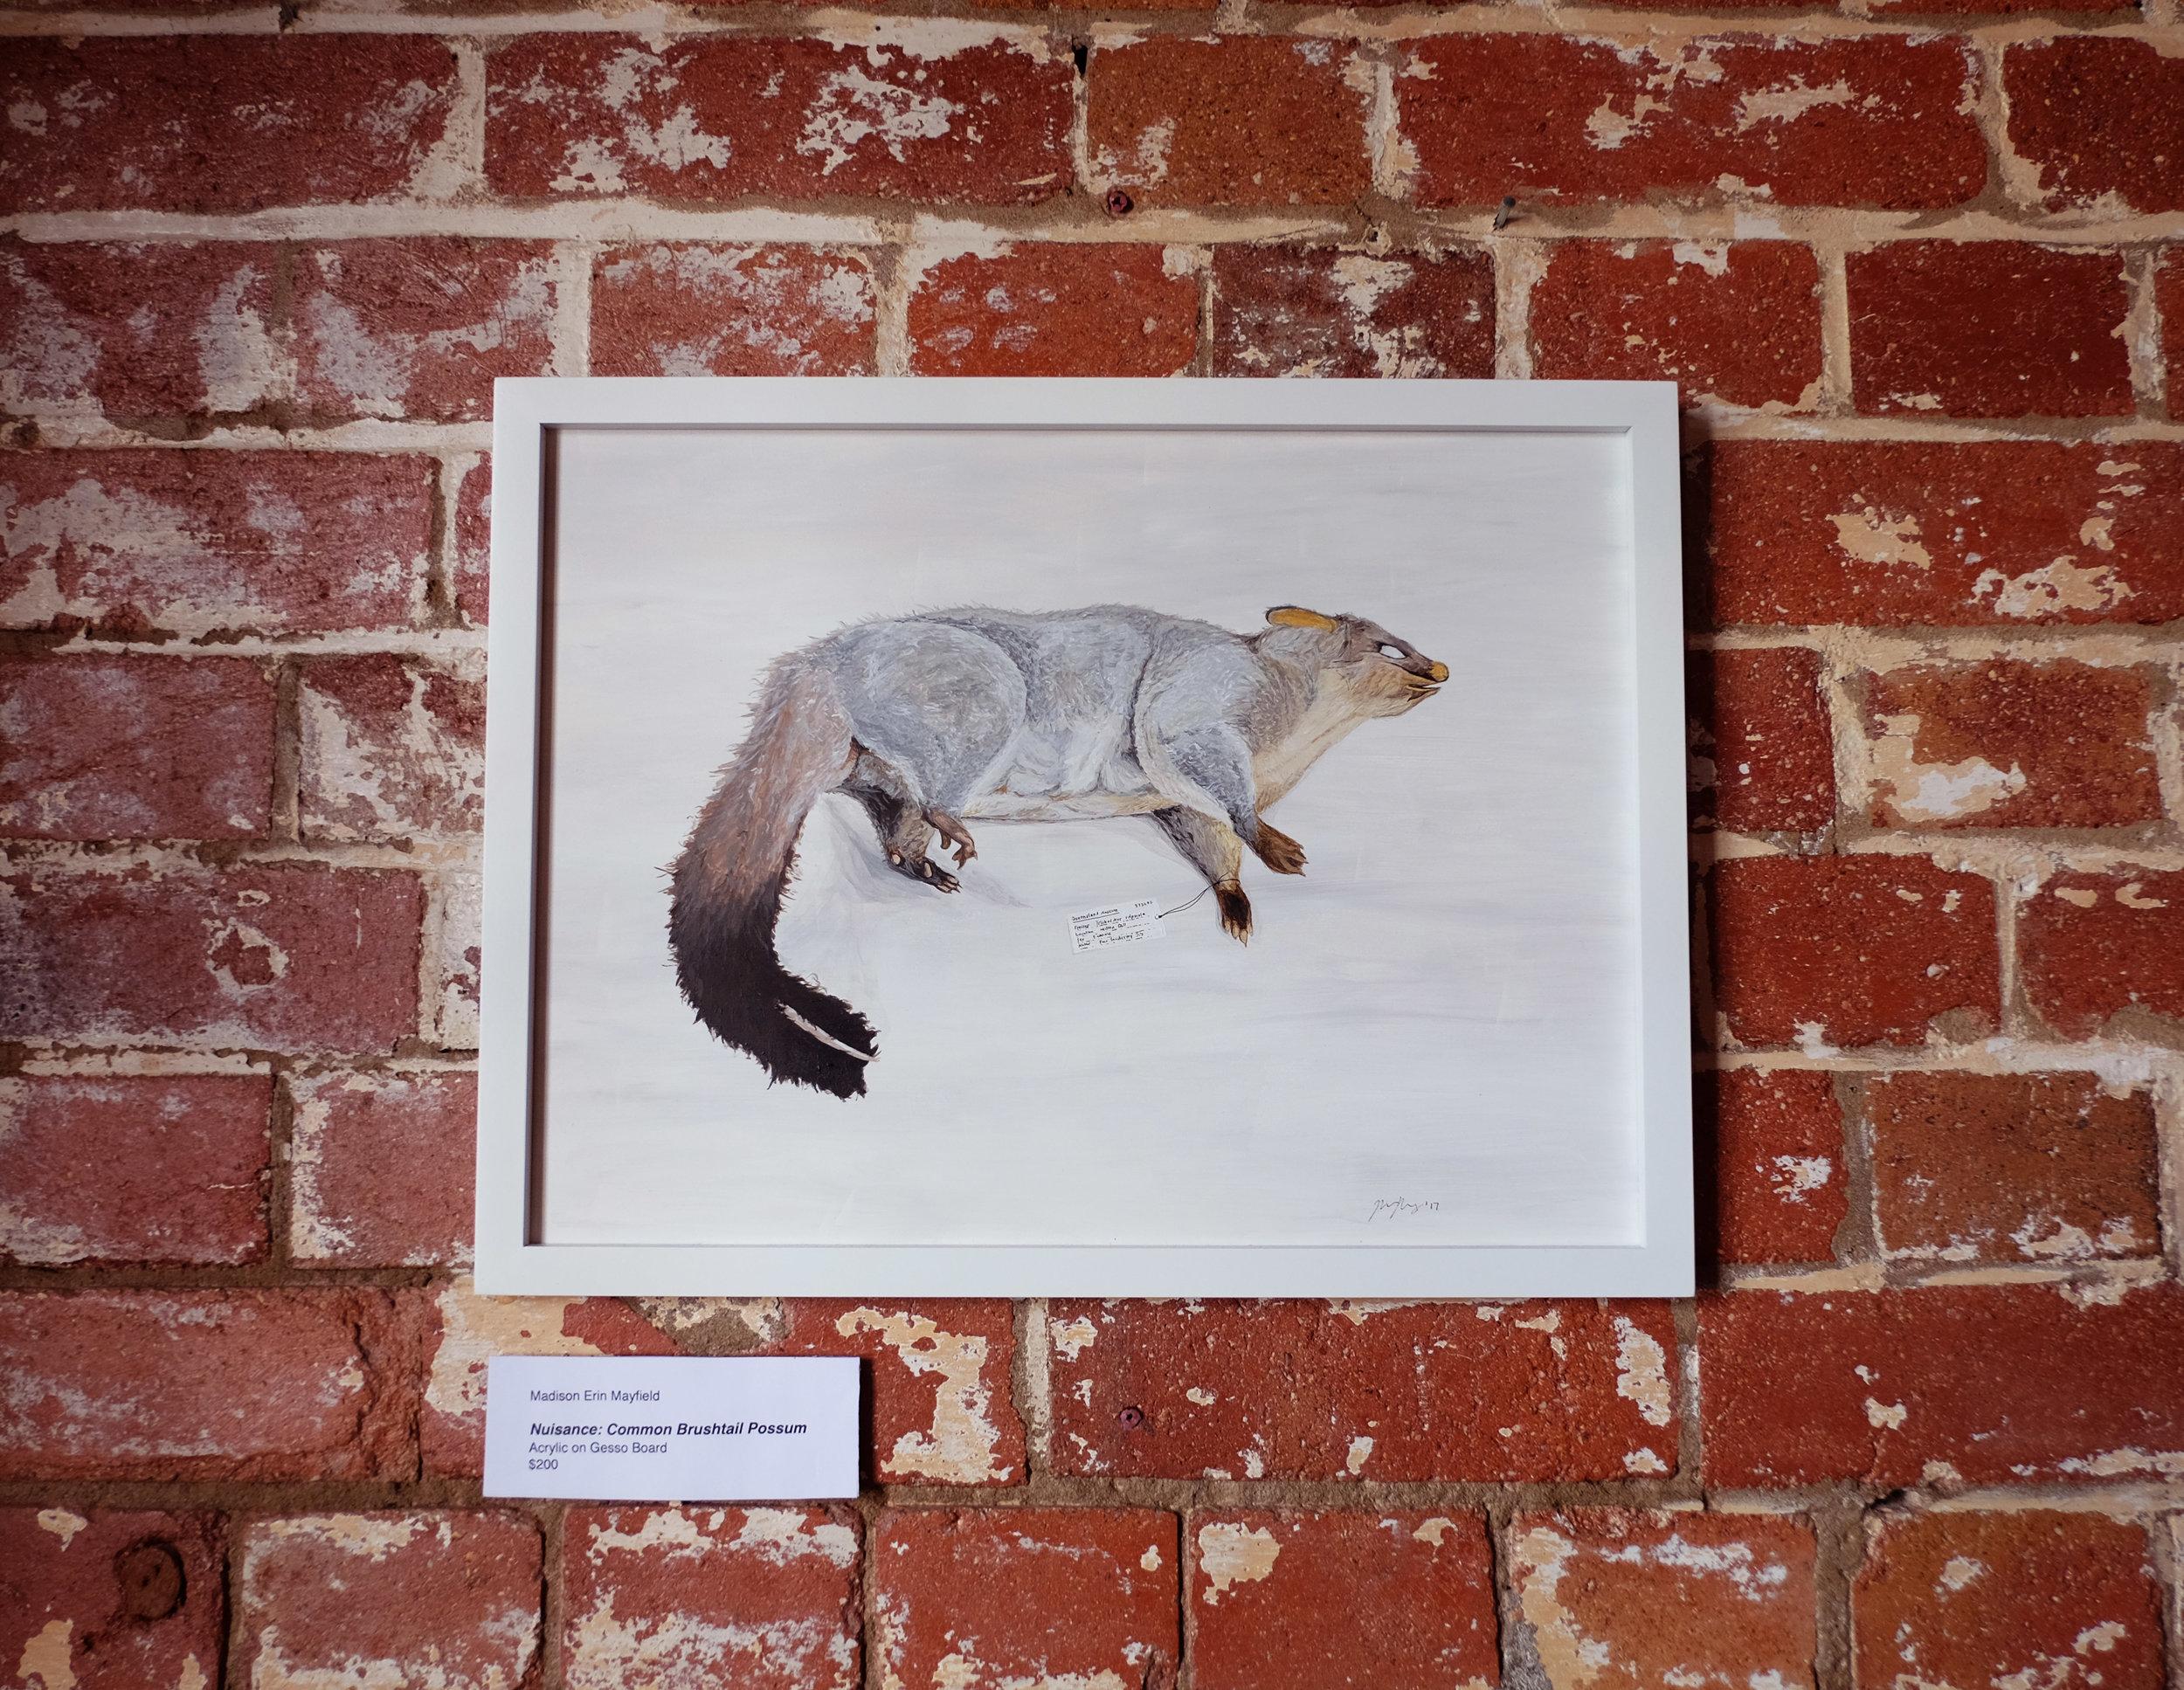 Scientific illustration of Australian possum by Madison Erin Mayfield